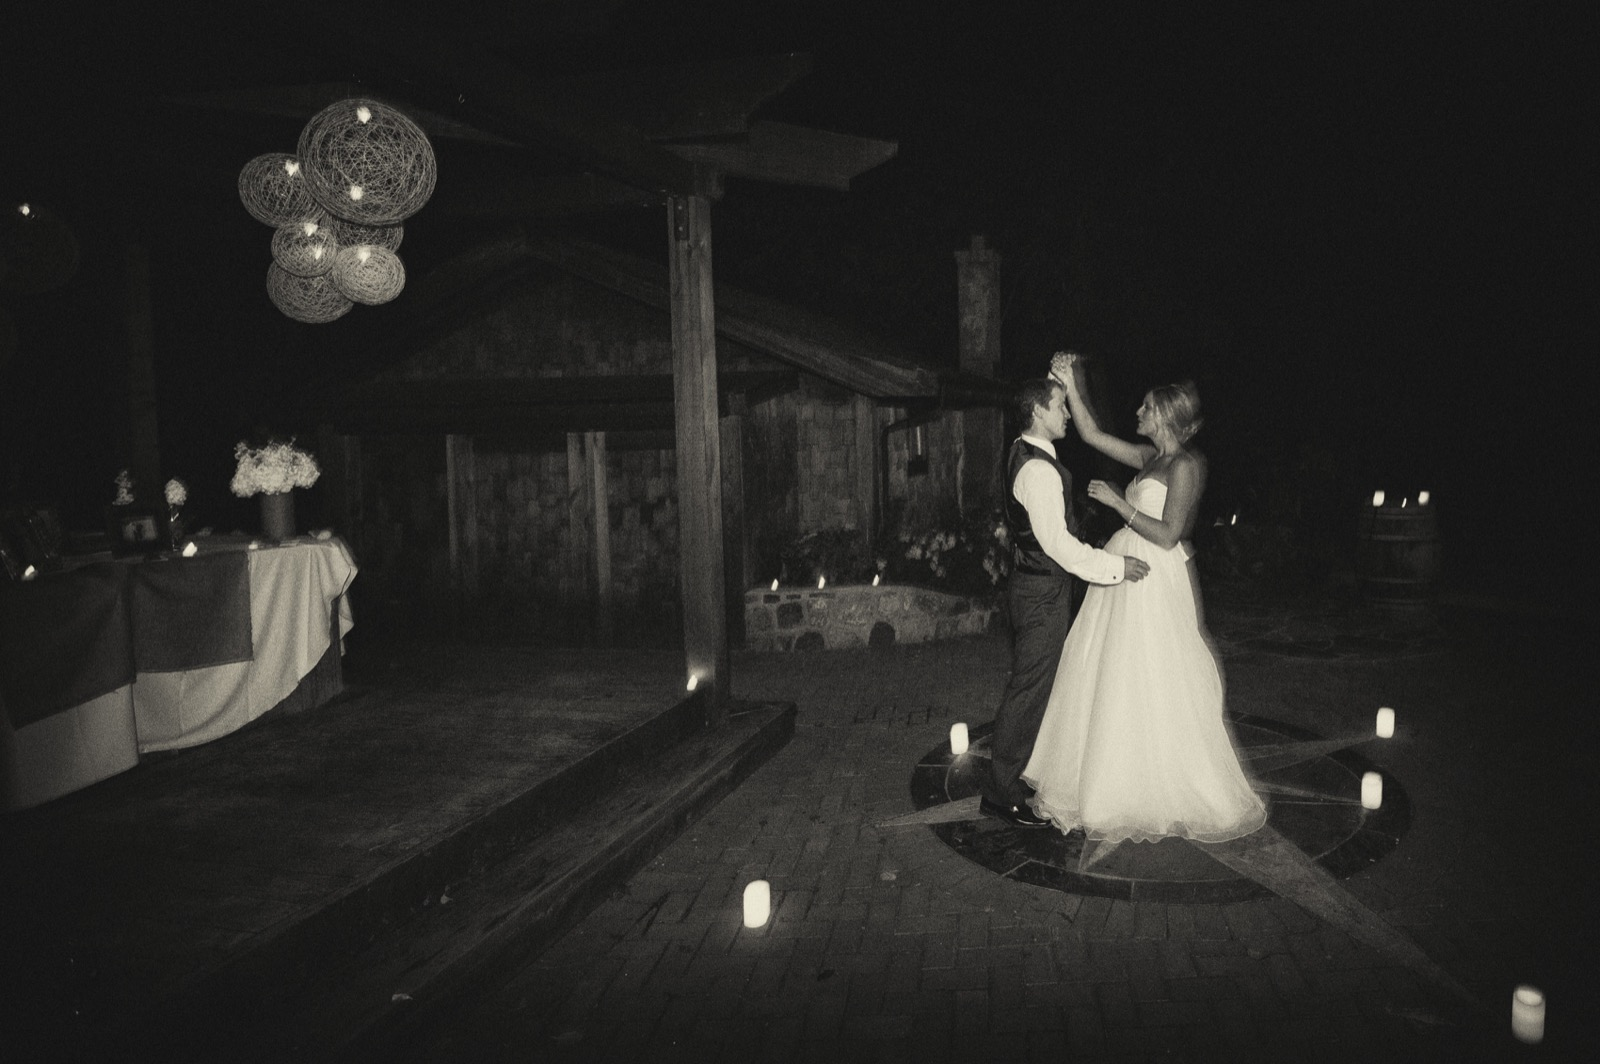 sooke-wedding-photographers-craidelonna-oceanedge-lodge-wedding-86.jpg